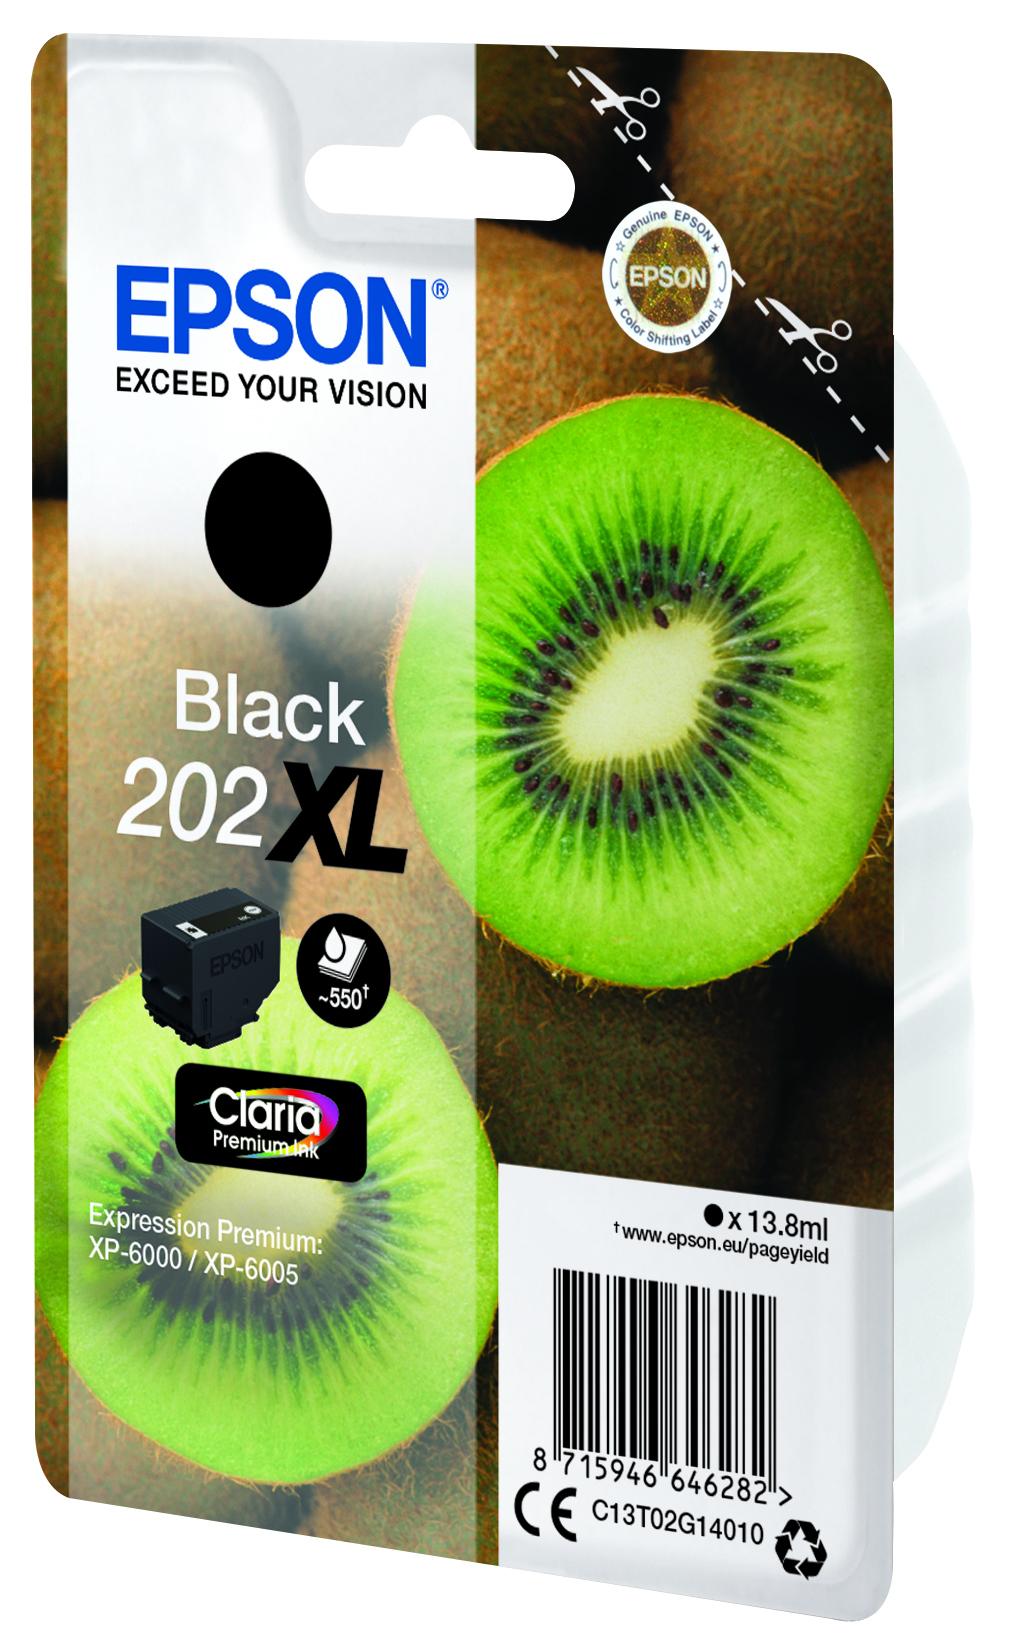 Epson-C13T02G14020-Kiwi-Singlepack-Black-202XL-Claria-Premium-Ink-Original thumbnail 4